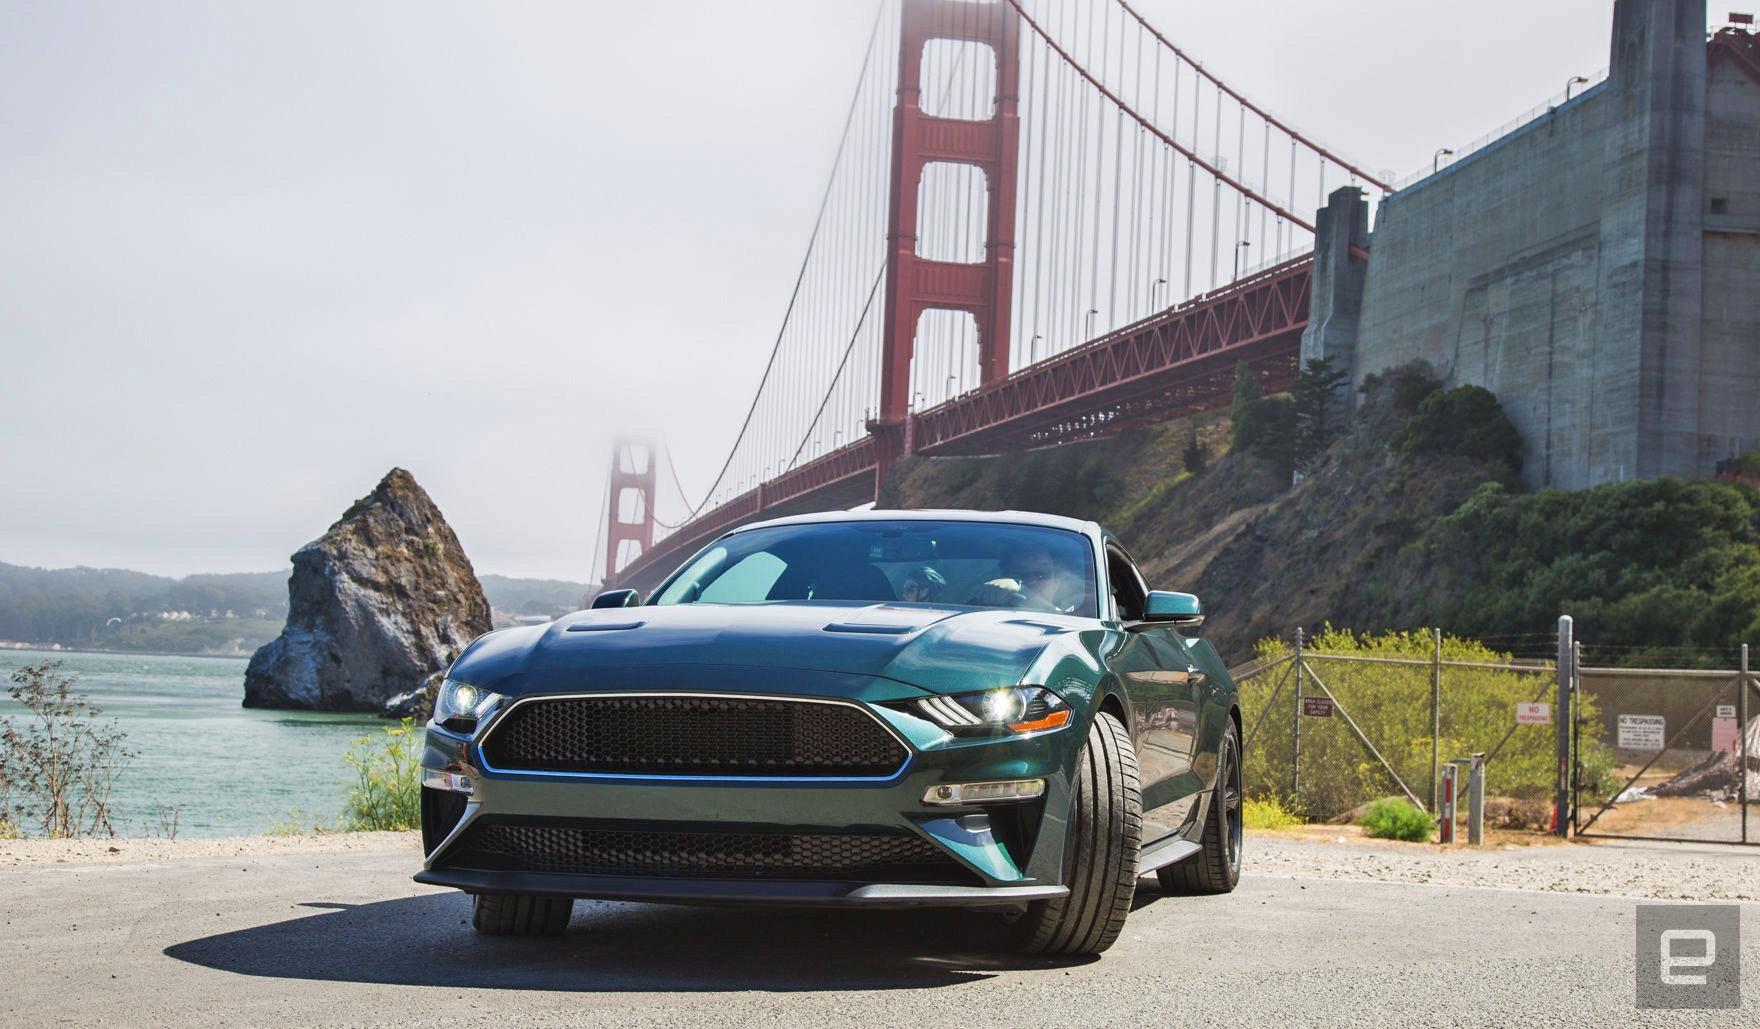 Ford Mustang Bullitt review: Almost Steve McQueen cool